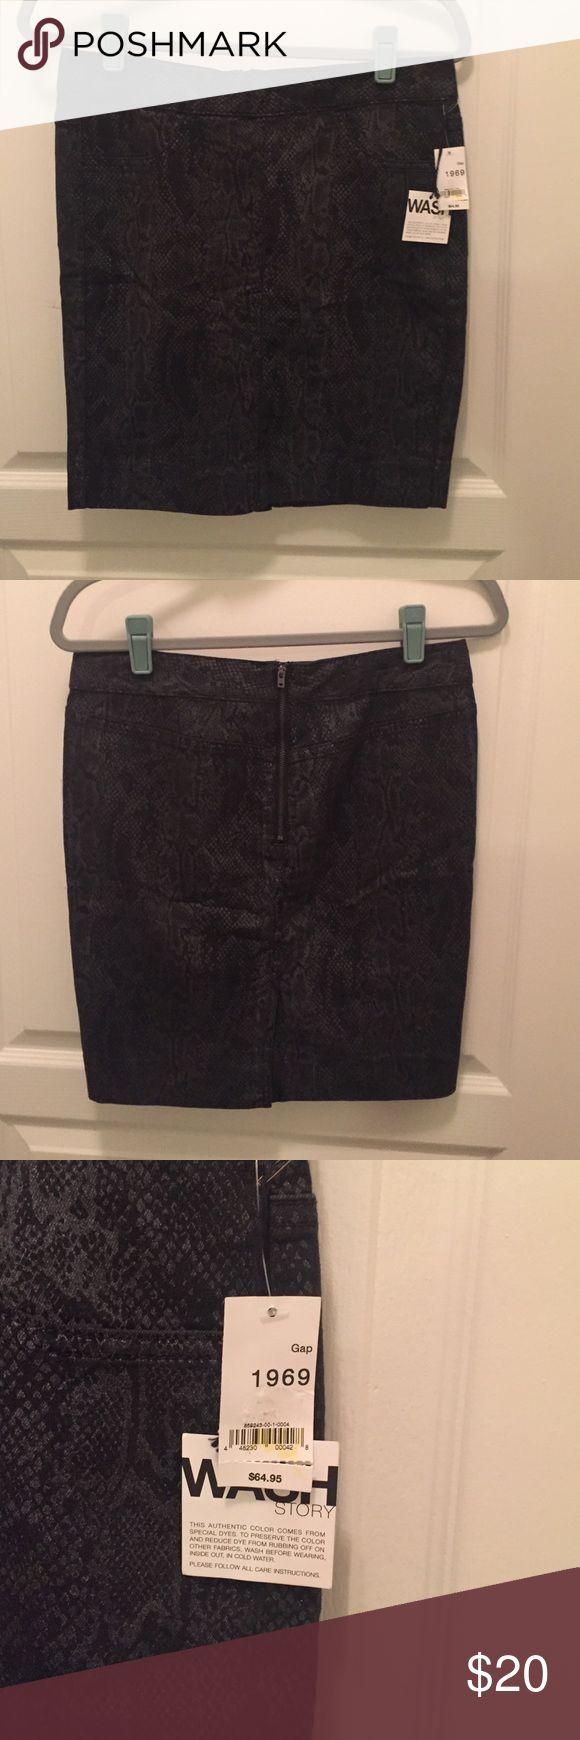 GAP 1969 sz 4 black/gray snakeskin print skirt NWT.  Cotton, polyester, Lycra mix material. GAP Skirts Pencil